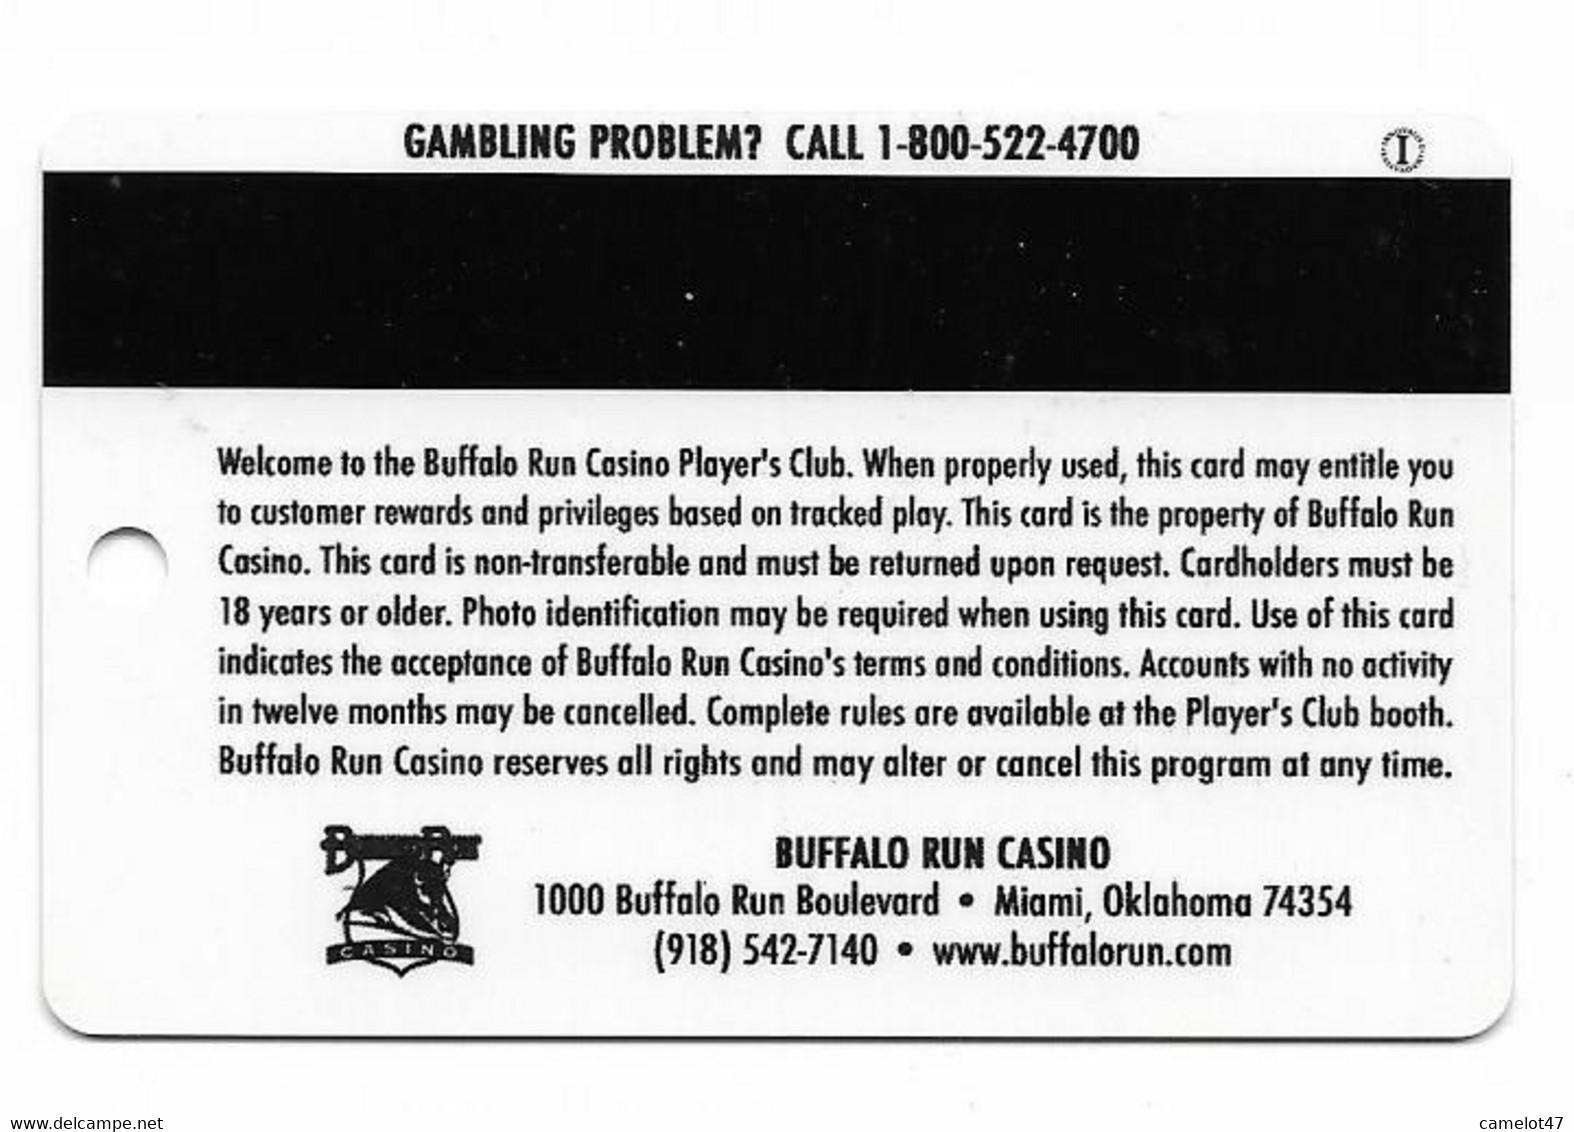 Buffalo Run Casino, Miami, OK, U.S.A., Older Used BLANK Slot Or Player's Card, # Buffalorun-3blank - Casino Cards